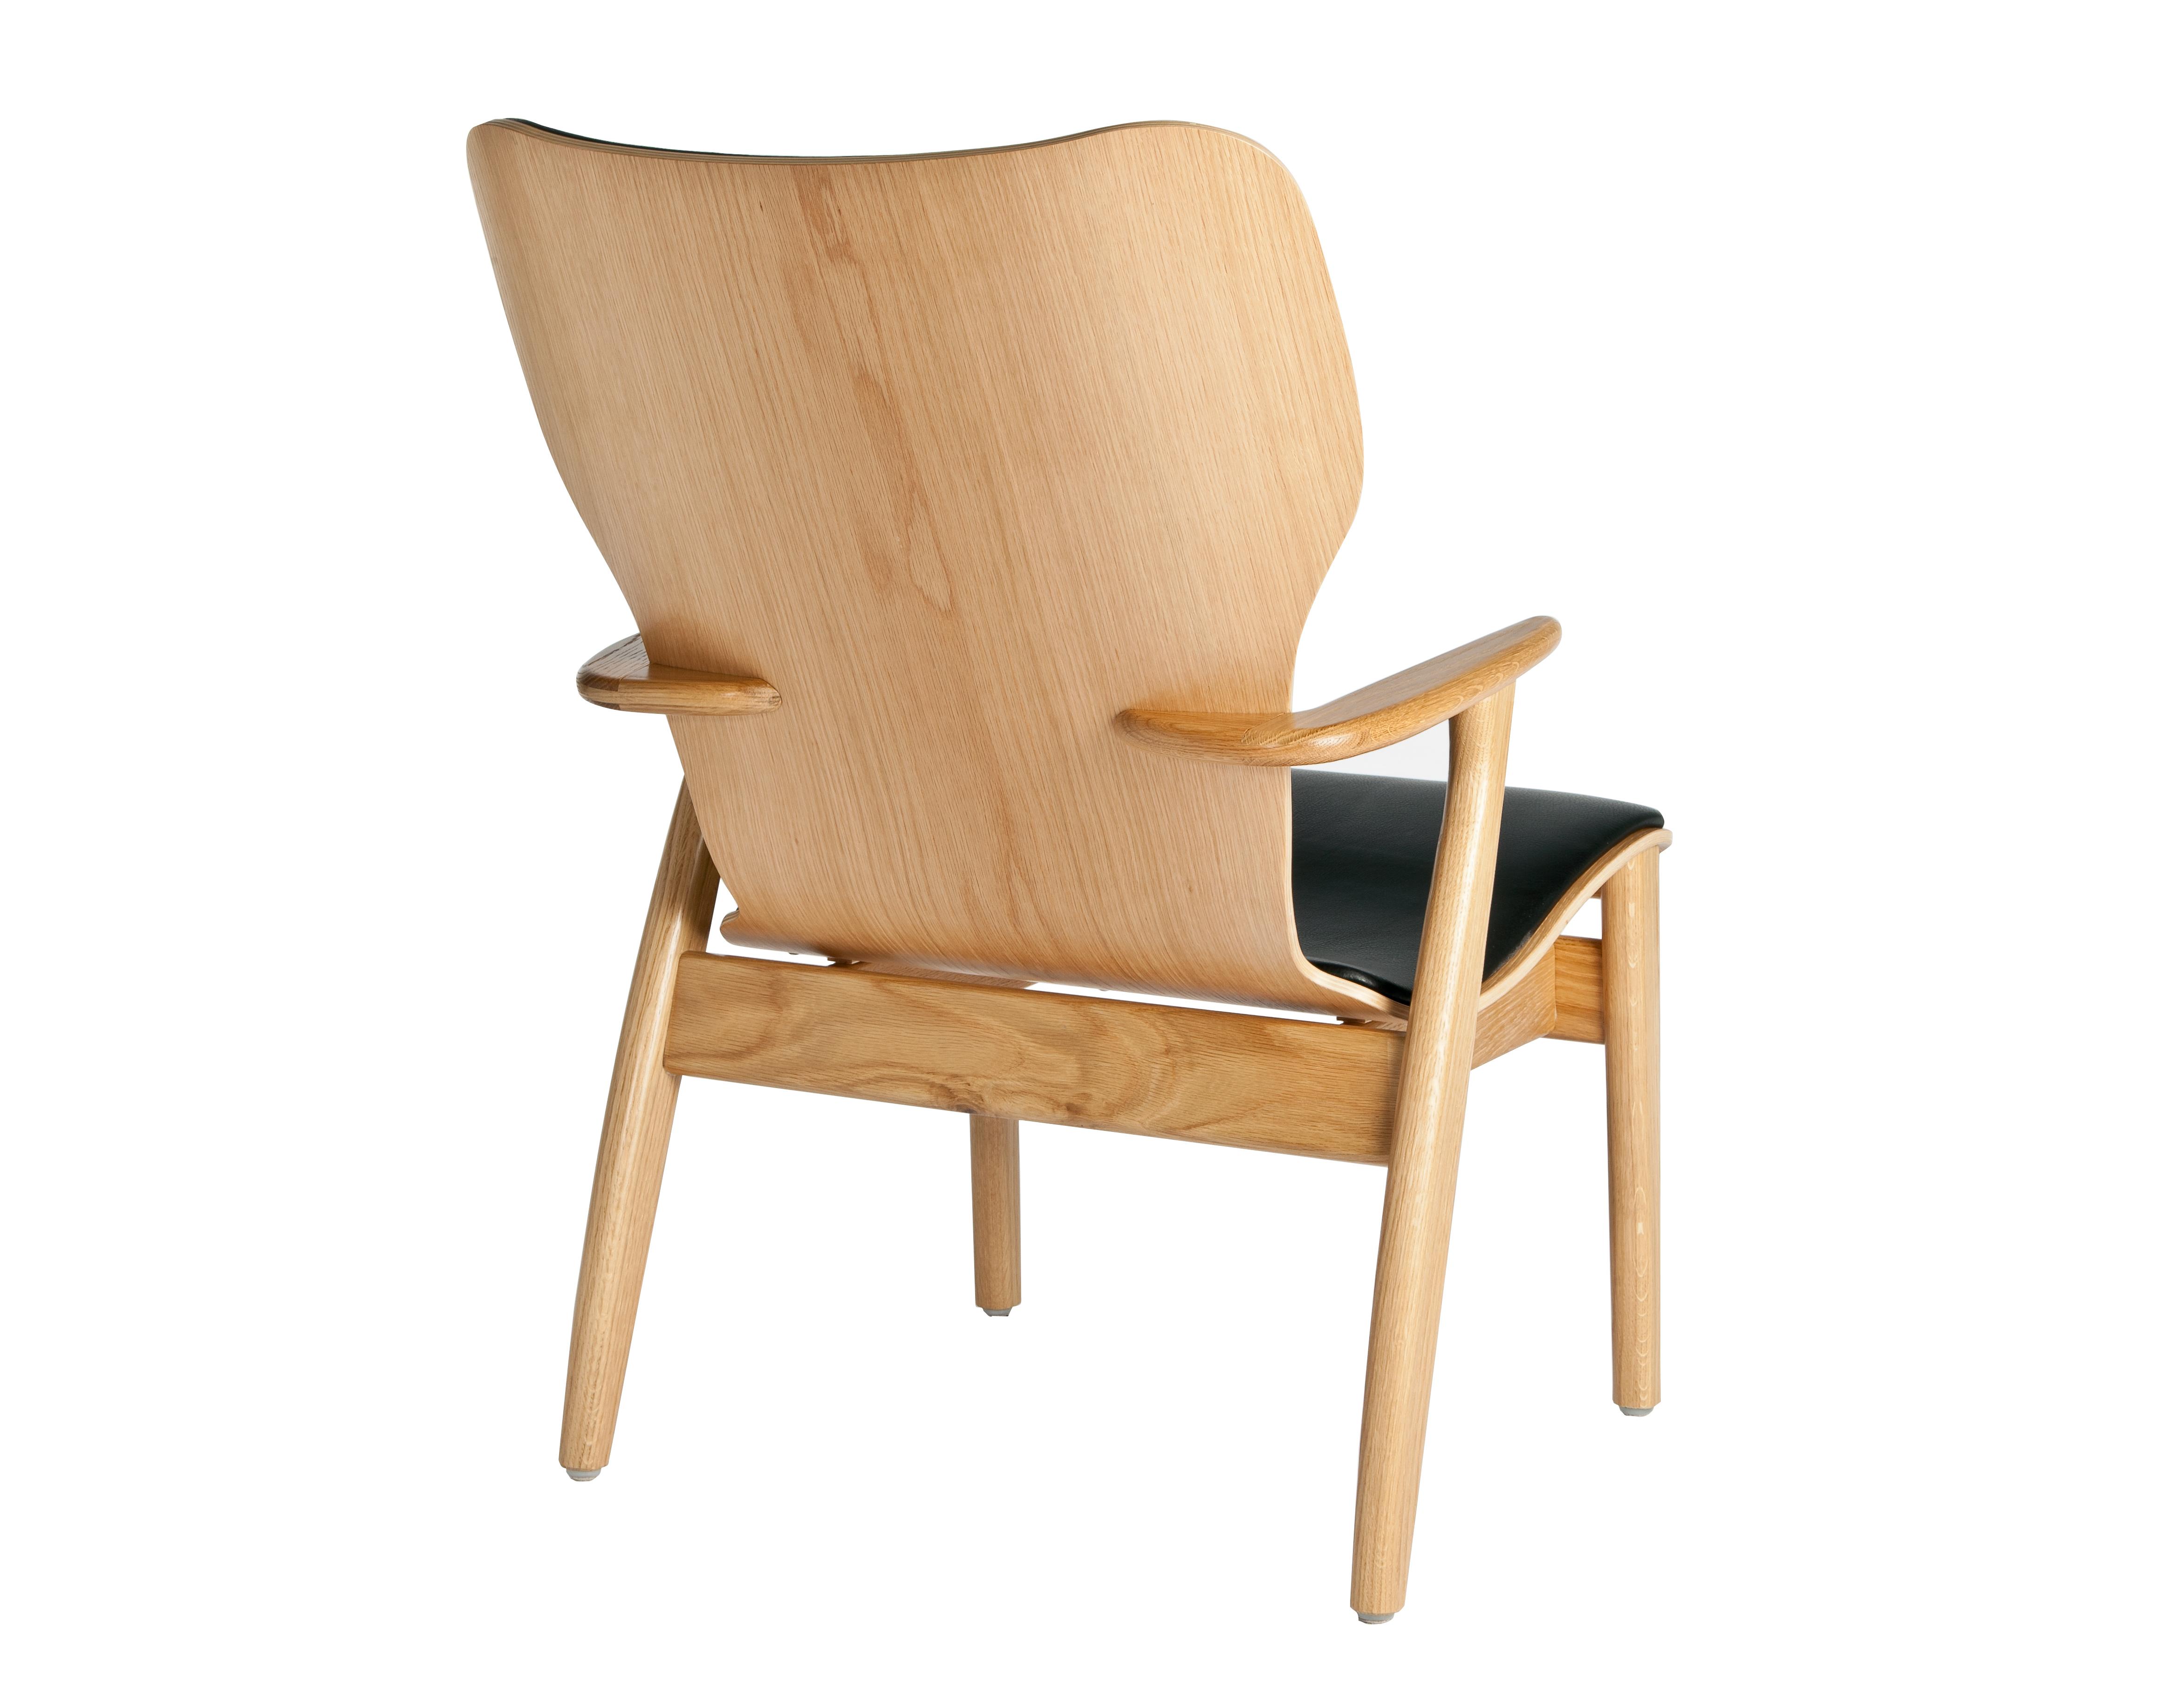 Artek Domus Lounge Chair Design Ilmari Tapiovaara